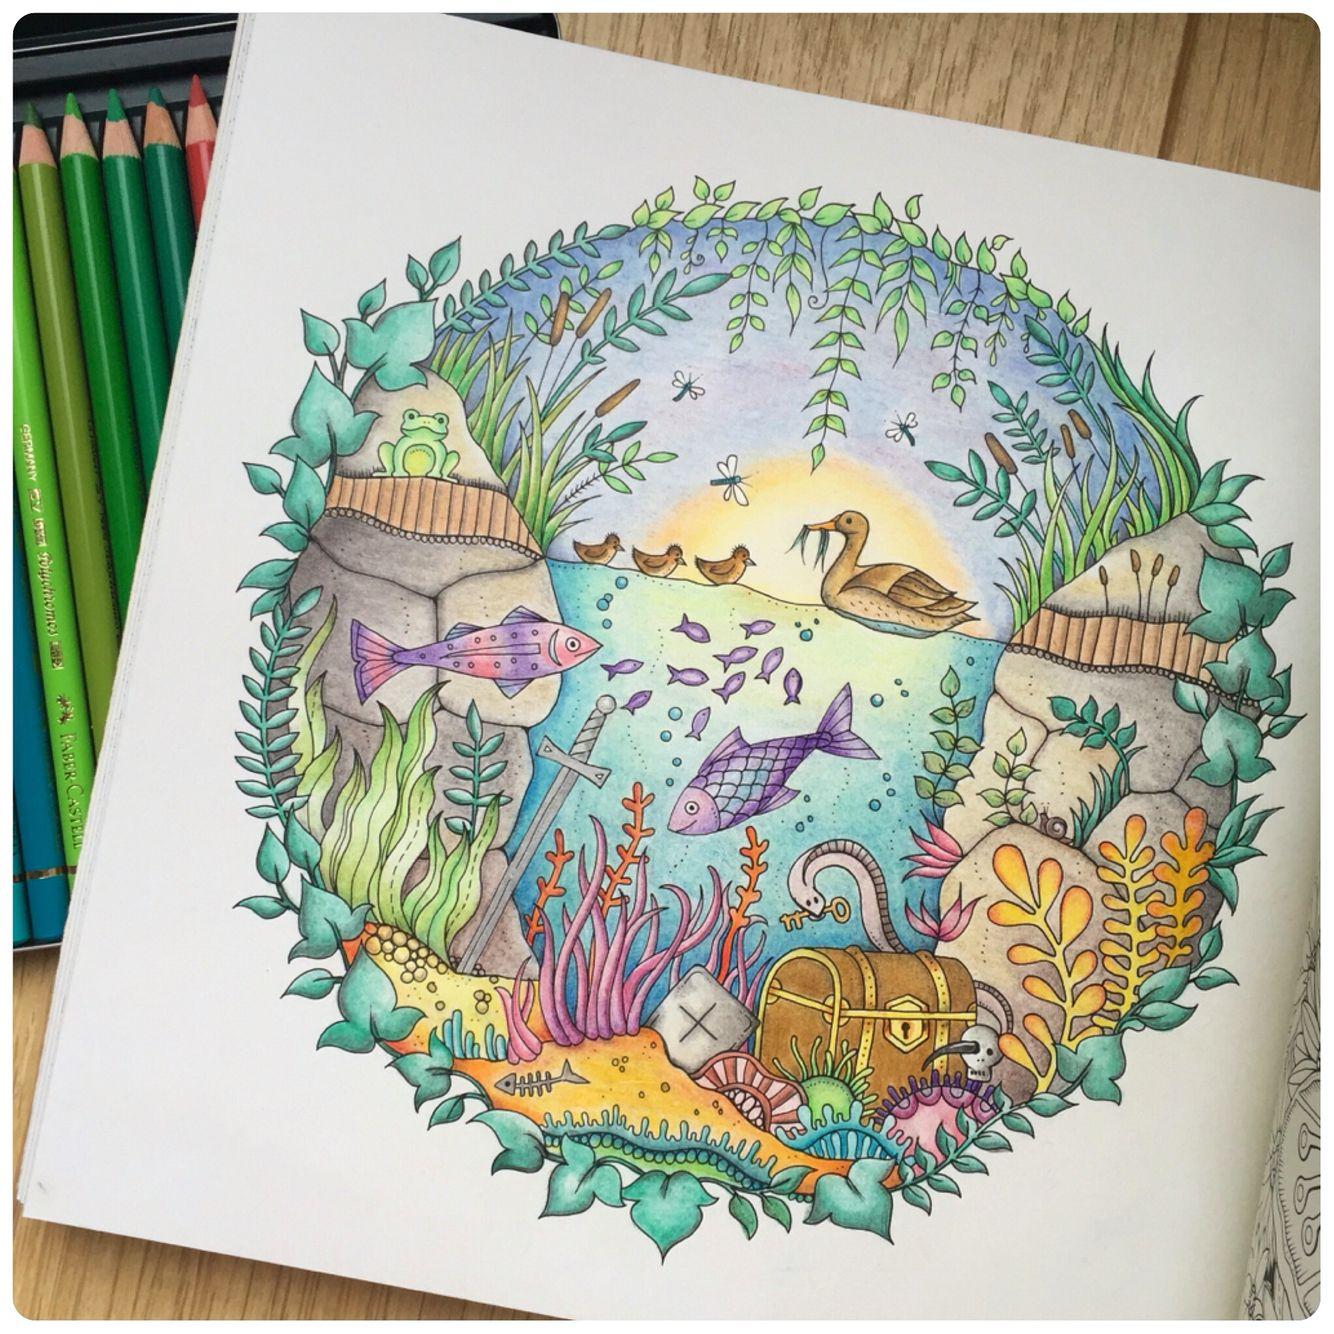 Book Enchanted Forest By Johanna Basford Medium